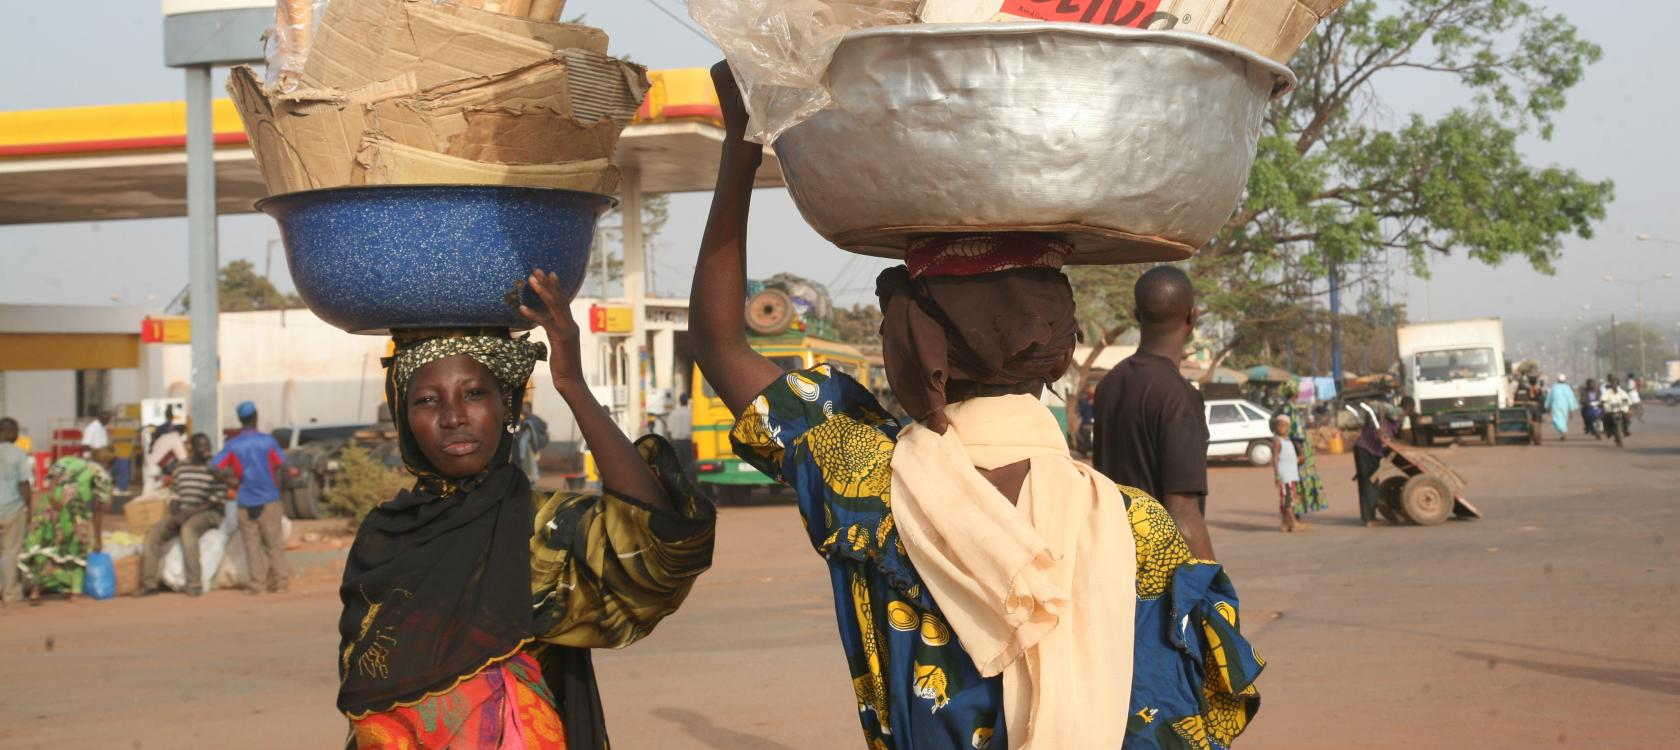 Femmes transportant des marchandises, Burkina Faso